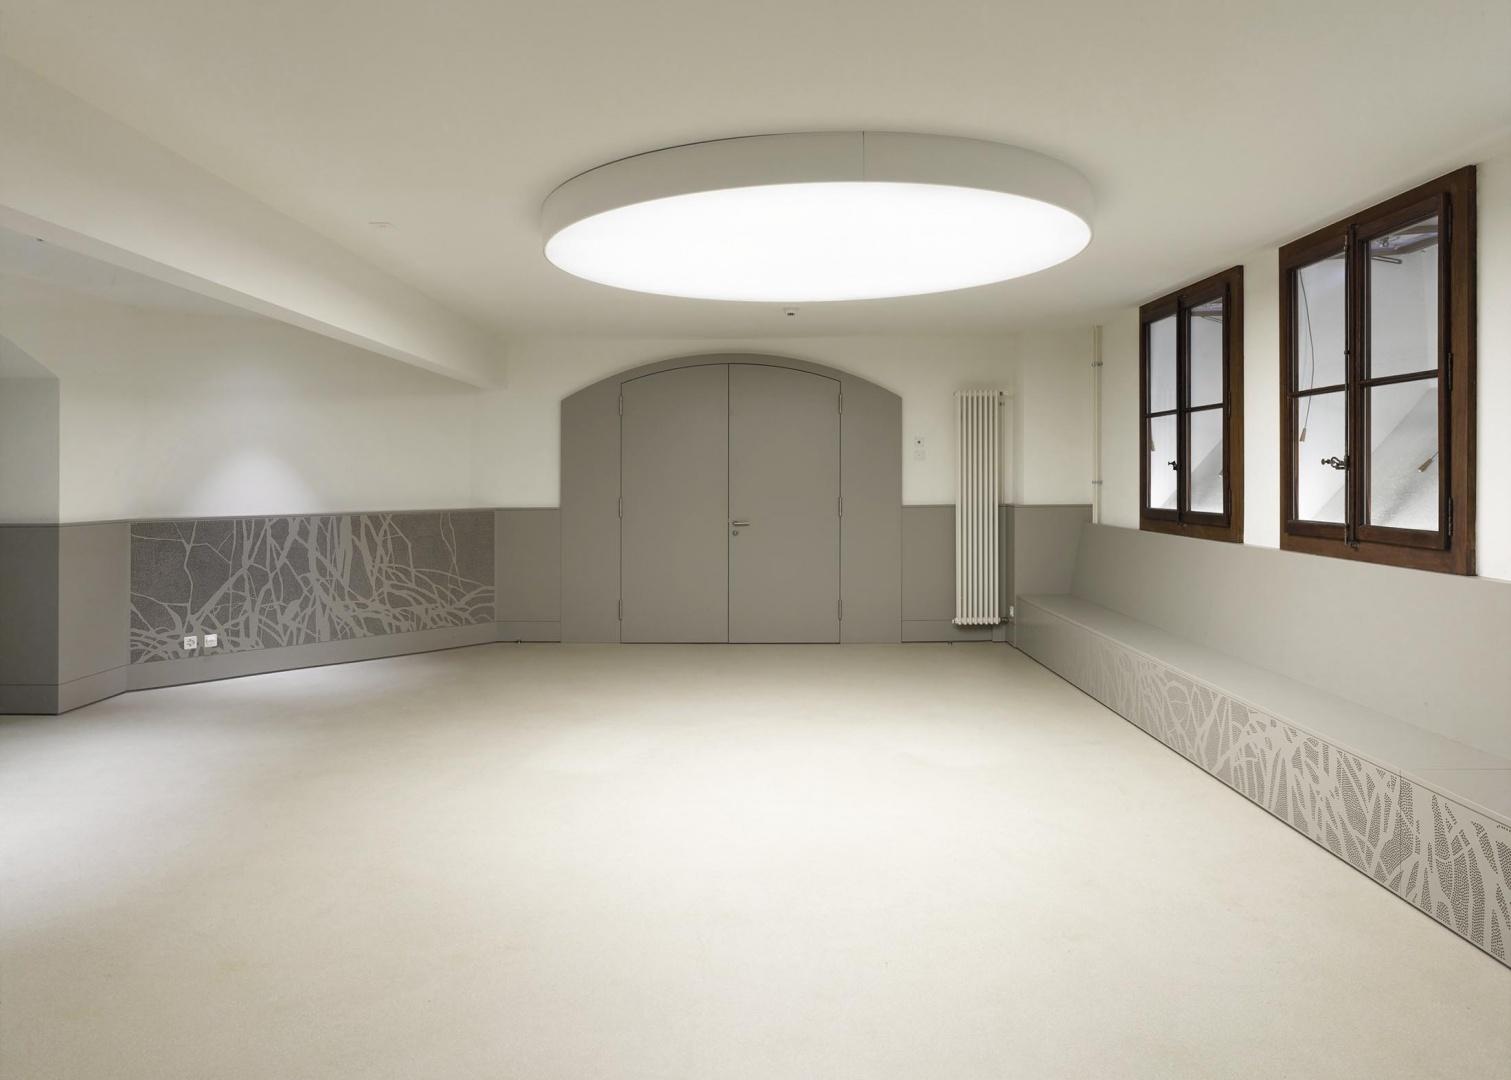 Auditorium Ernest Ansermet © Alexander Gempeler, Bern